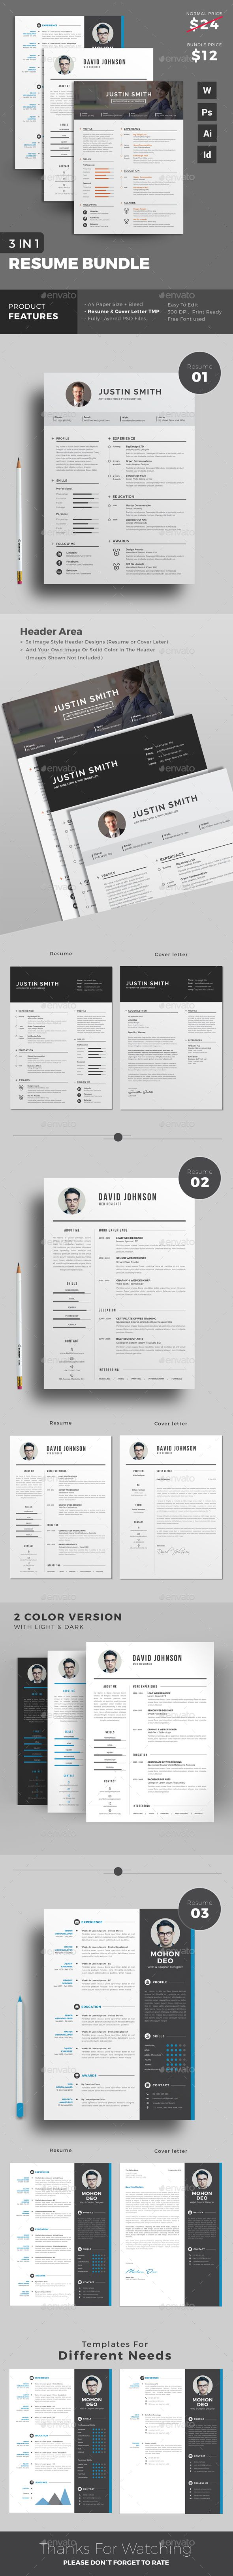 8 best cv tips images on pinterest cv tips cv resume template and